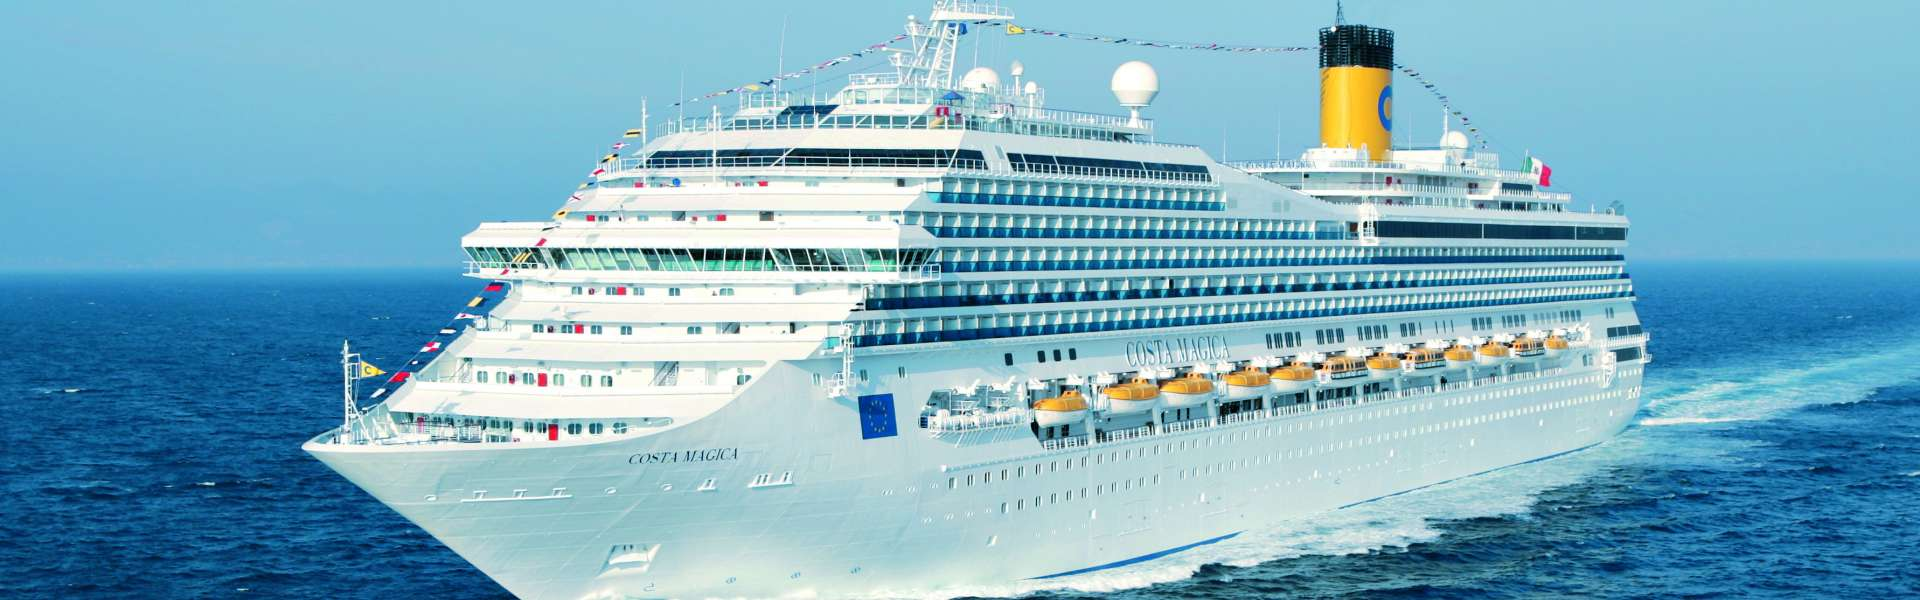 Croaziera 2018 - Caraibele de Est (Guadaloupe) - Costa Cruises - Costa Magica - 7 nopti